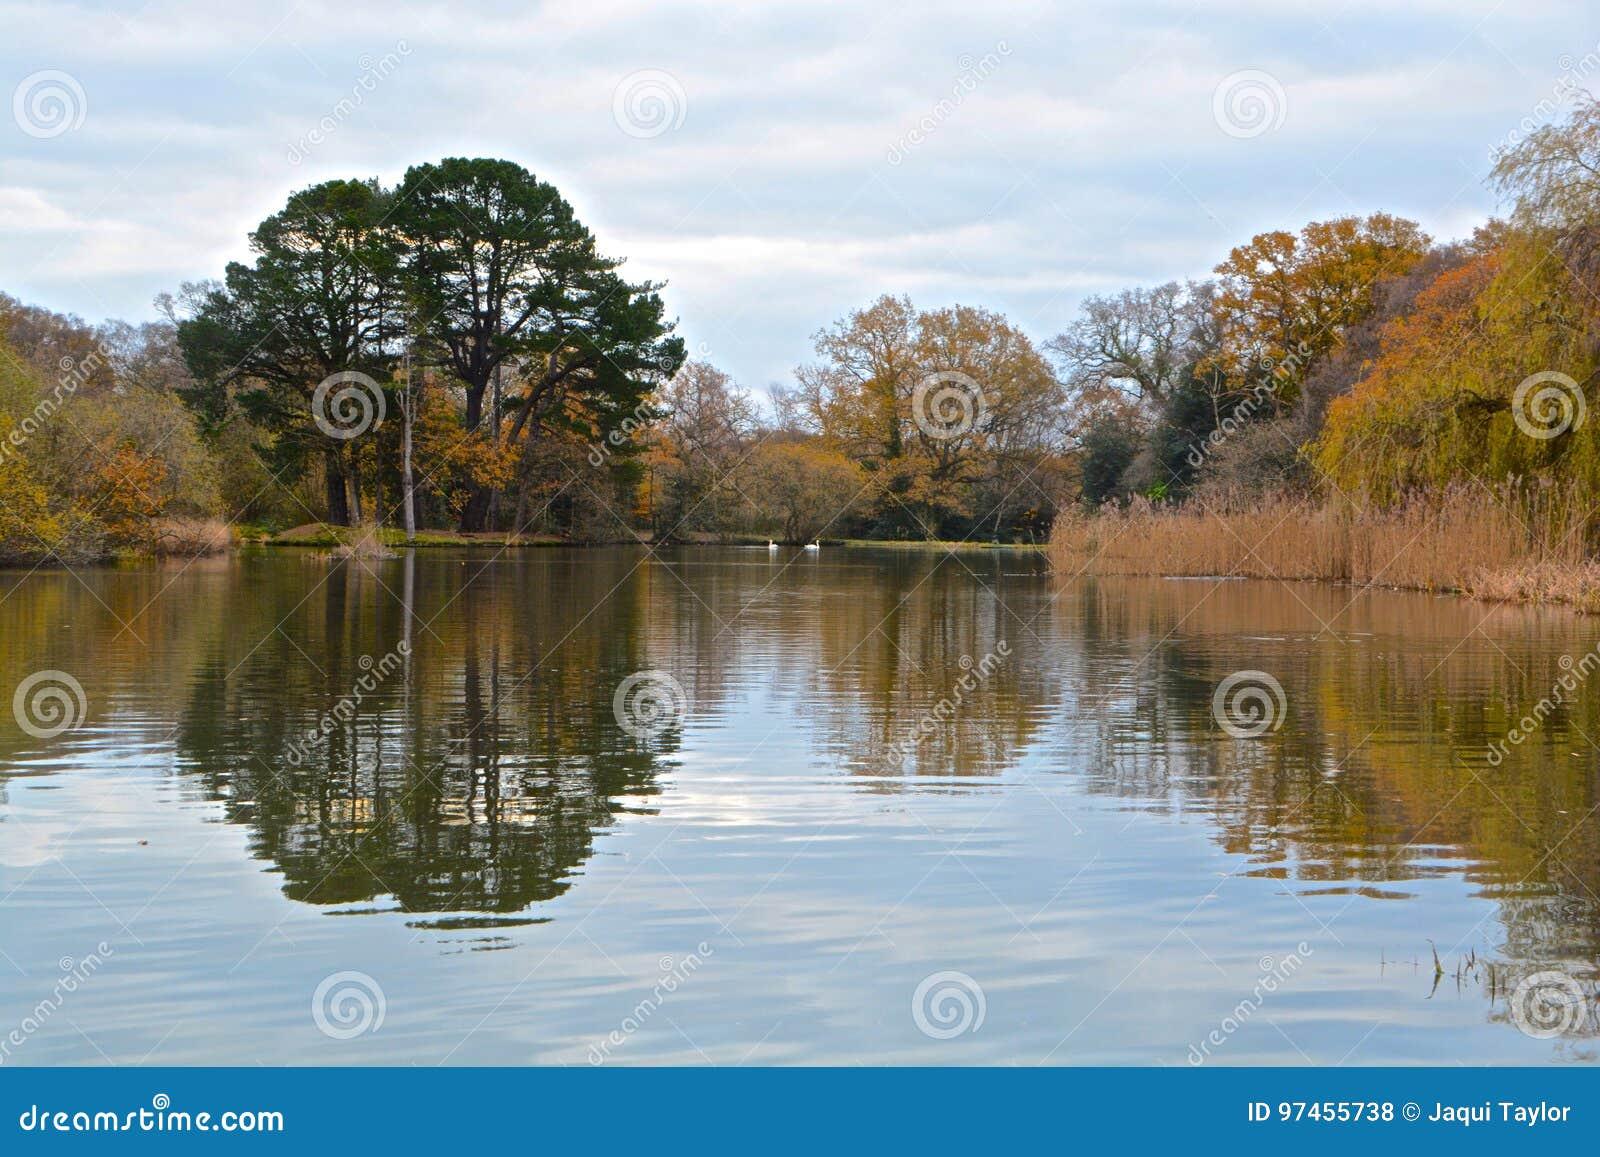 Autumn at the Ornamental Pond, Southampton